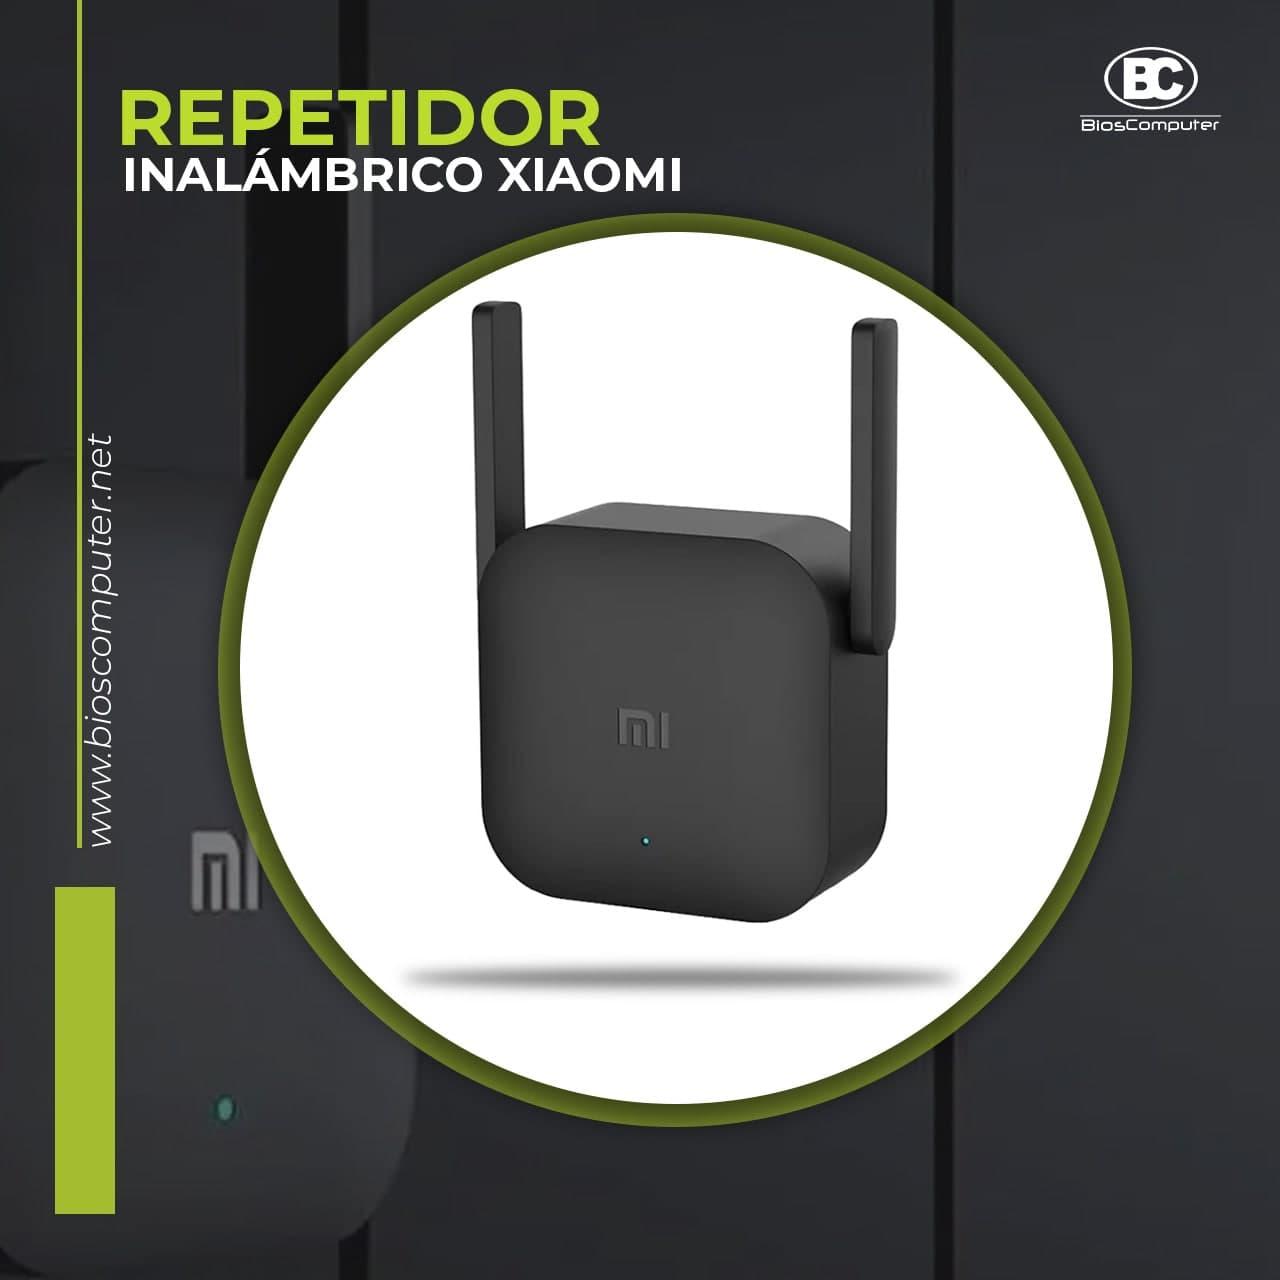 Repetidor Xiaomi